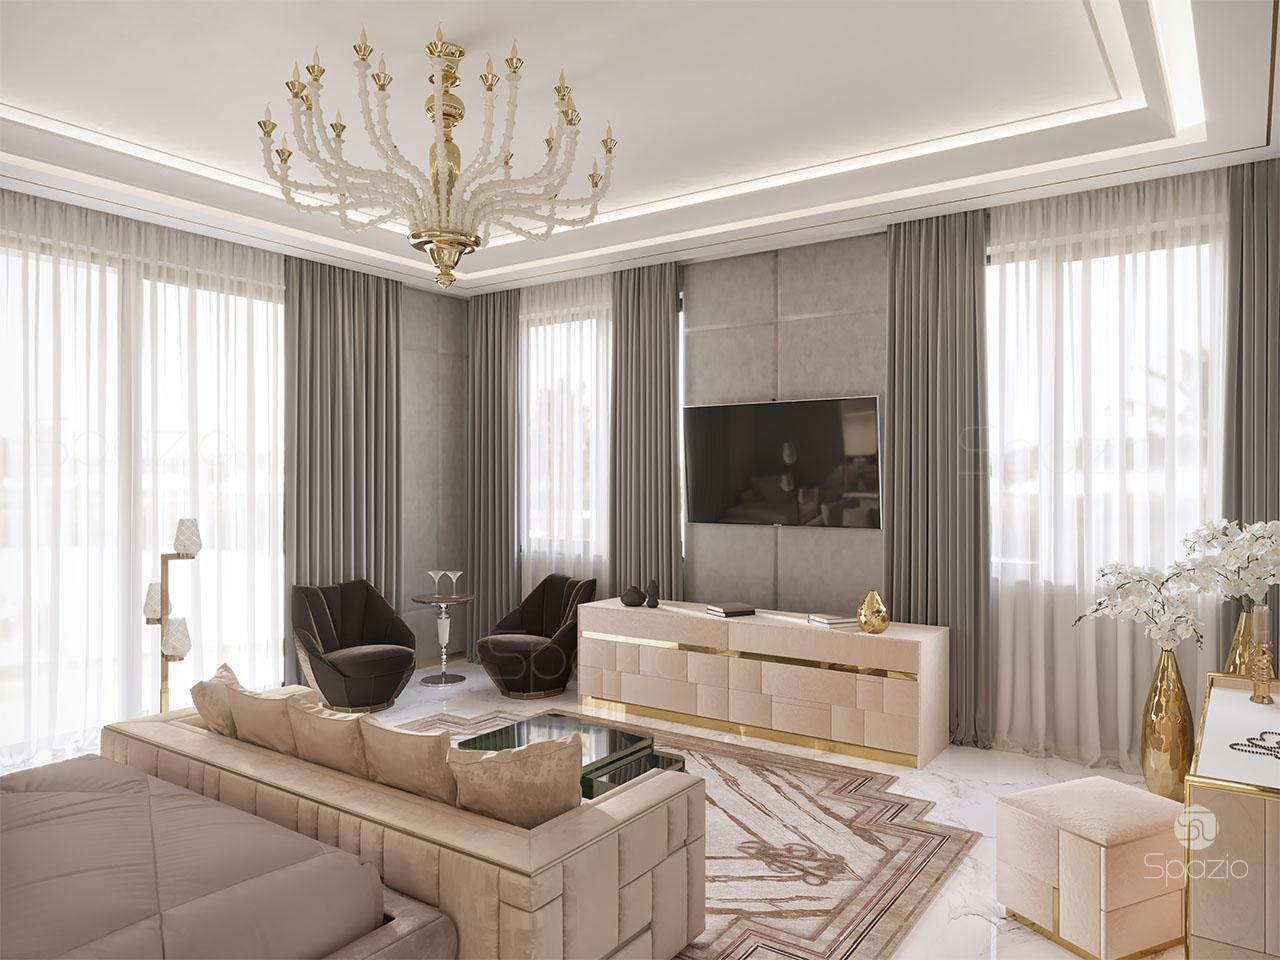 Luxury Master bedroom interior design in Dubai | 2020 | Spazio on Luxury Master Bedroom  id=31958